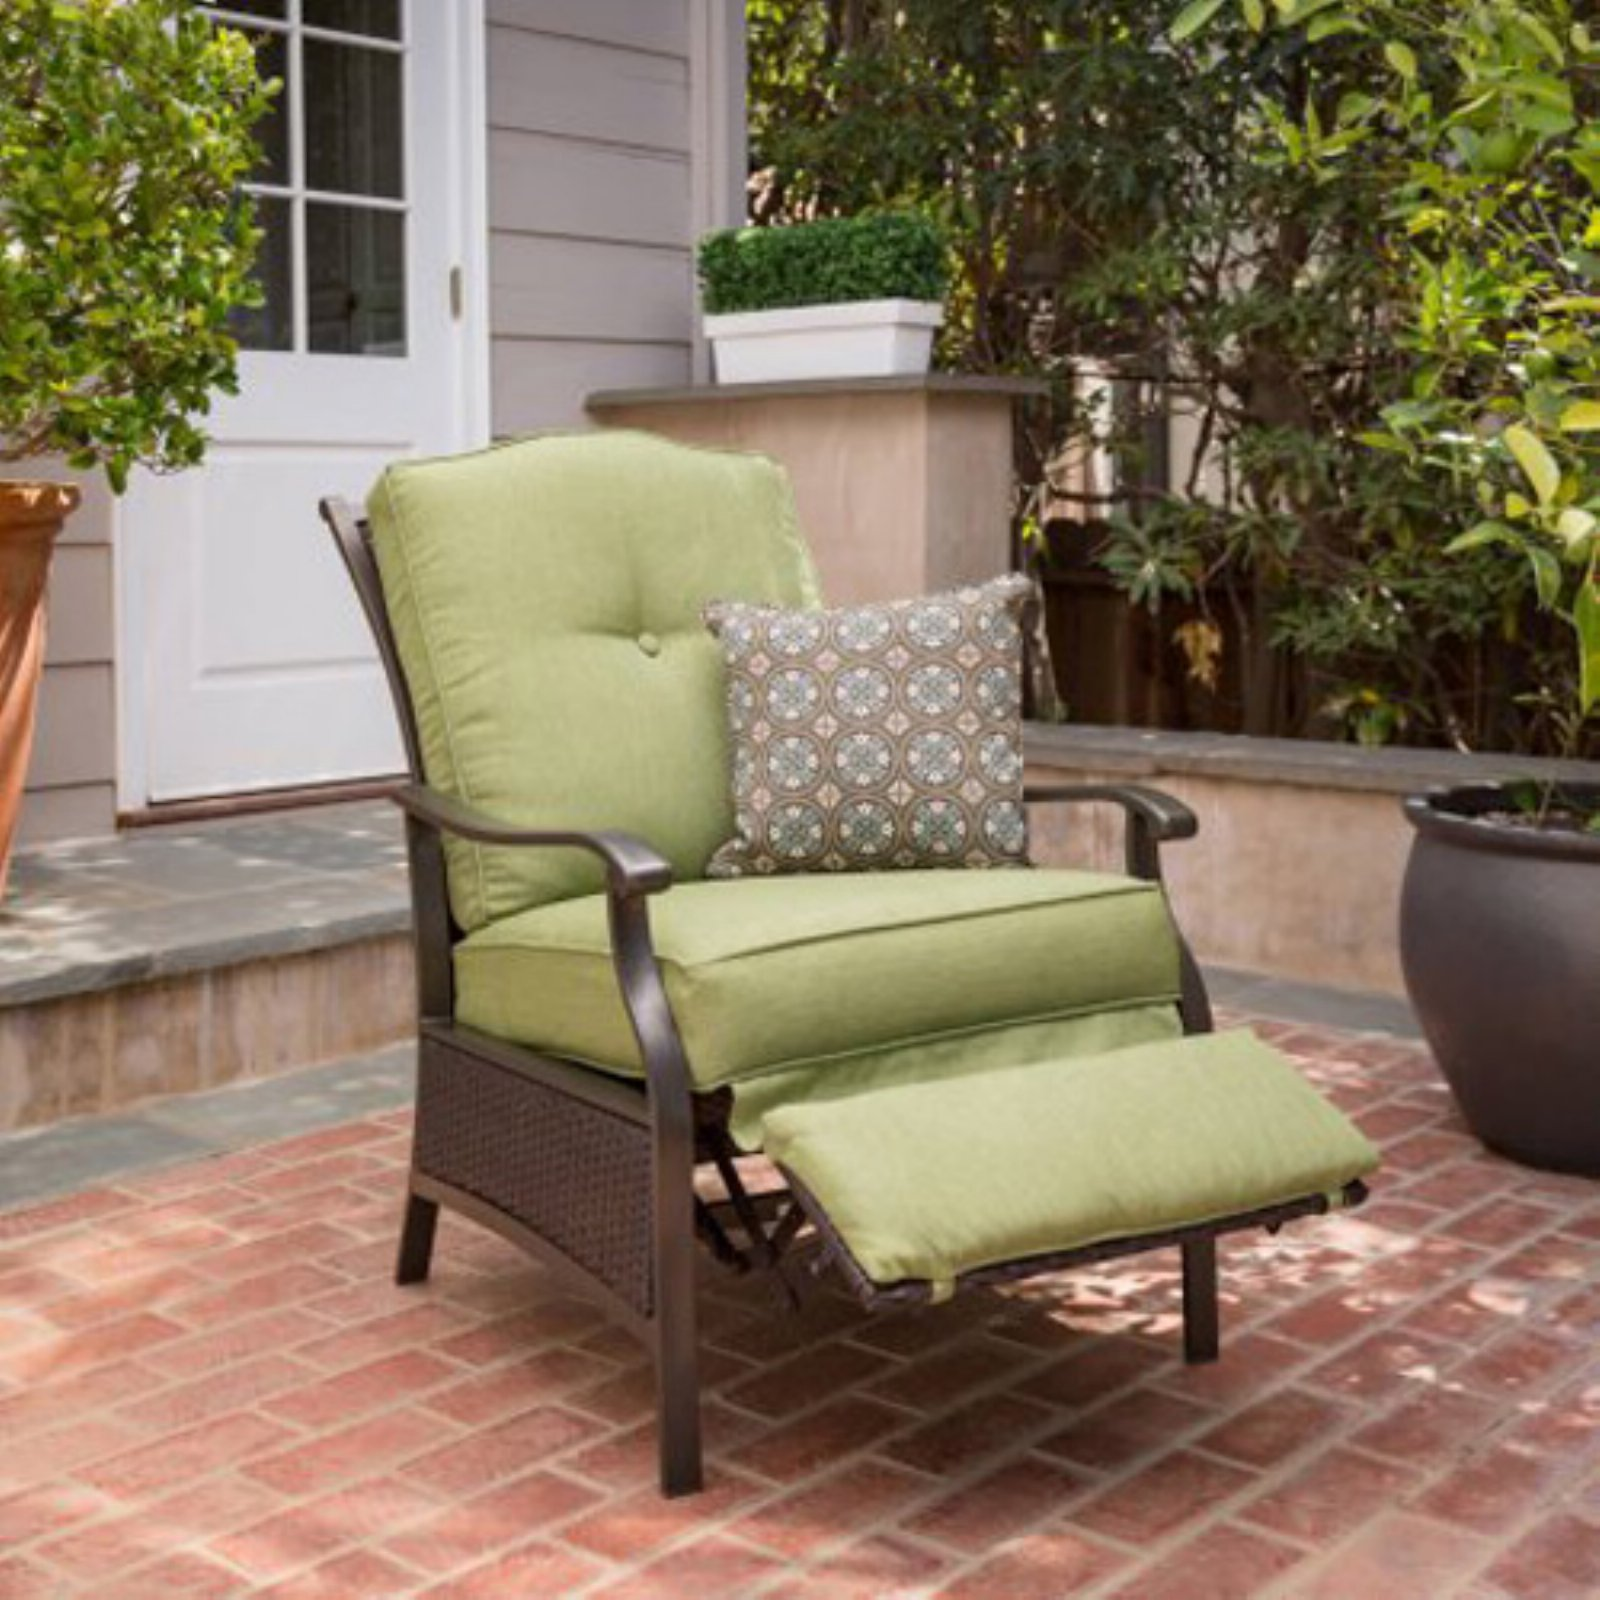 Better Homes & Gardens Providence Outdoor Recliner Green